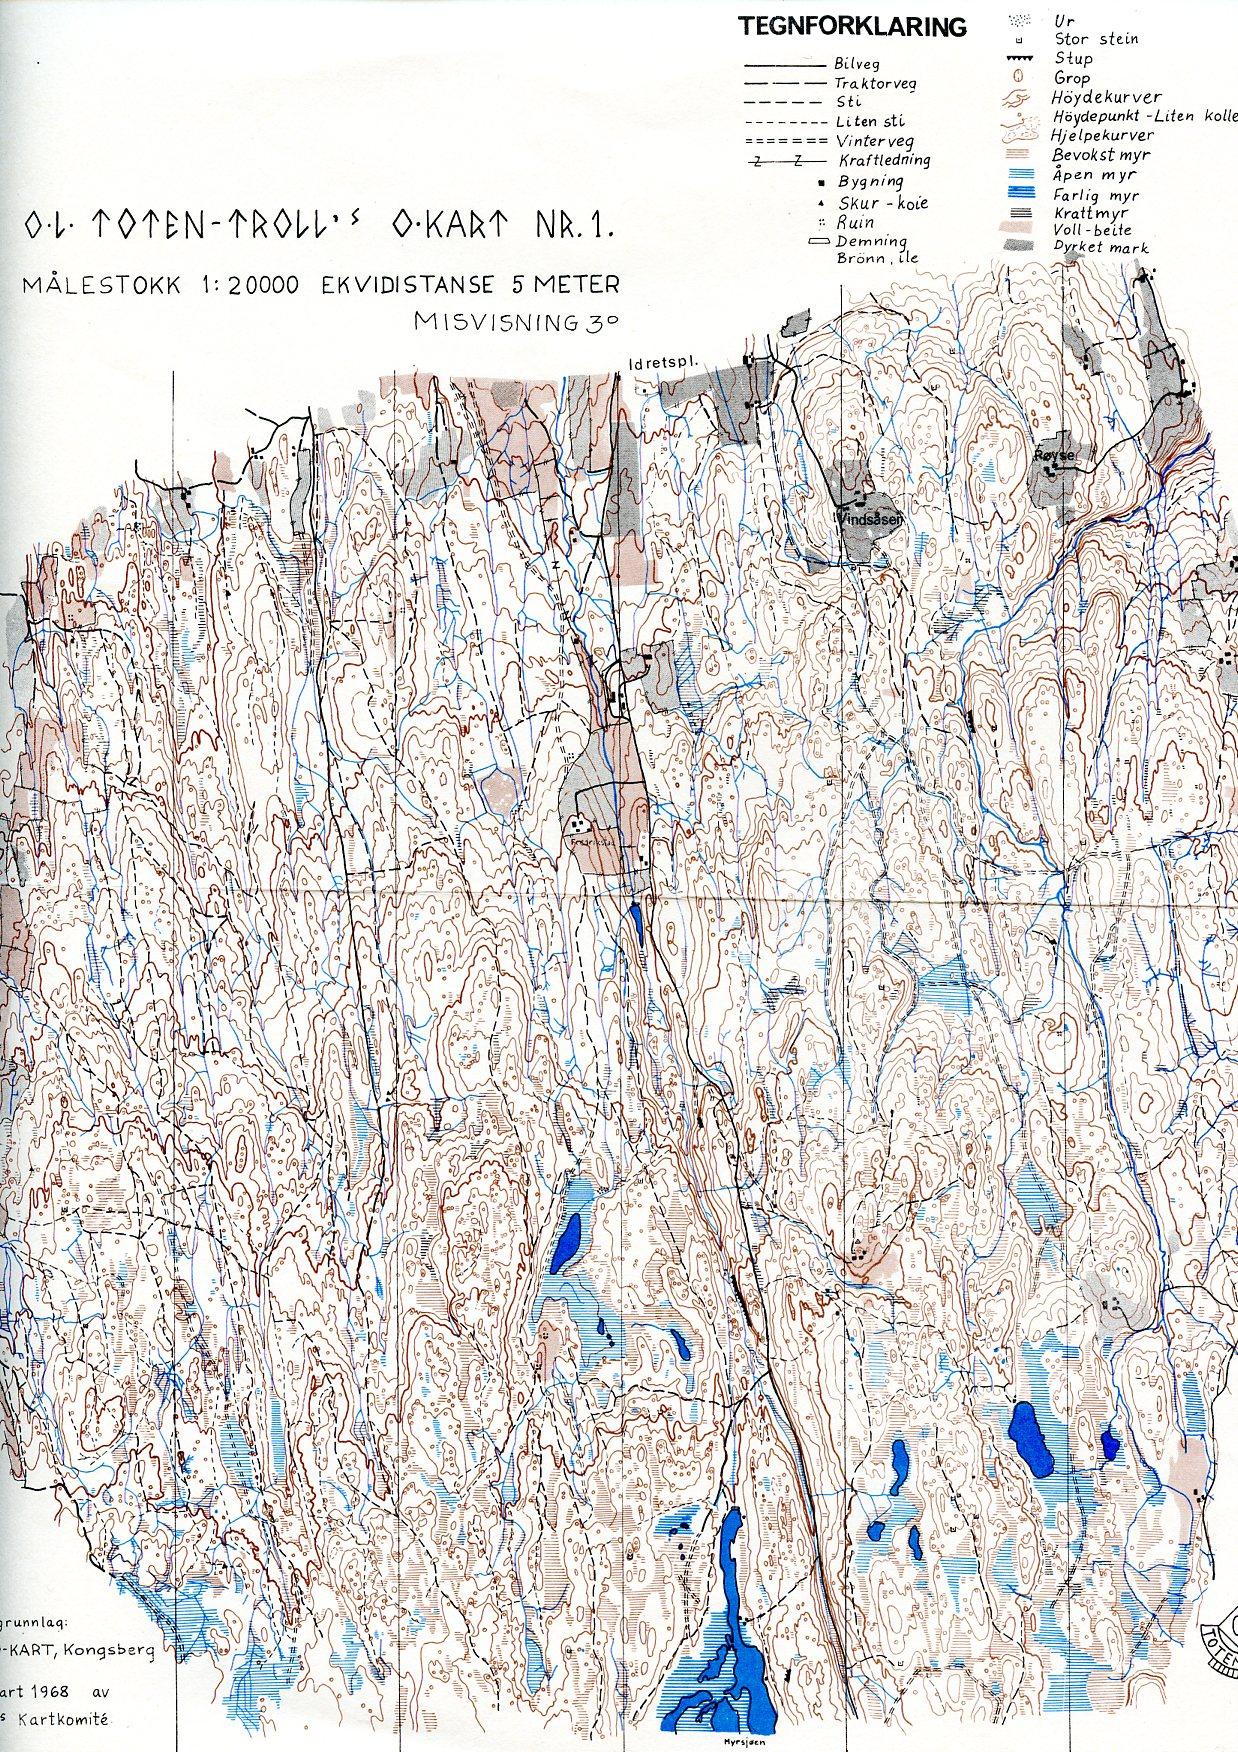 totenåsen kart Historikk – OL Toten Troll totenåsen kart